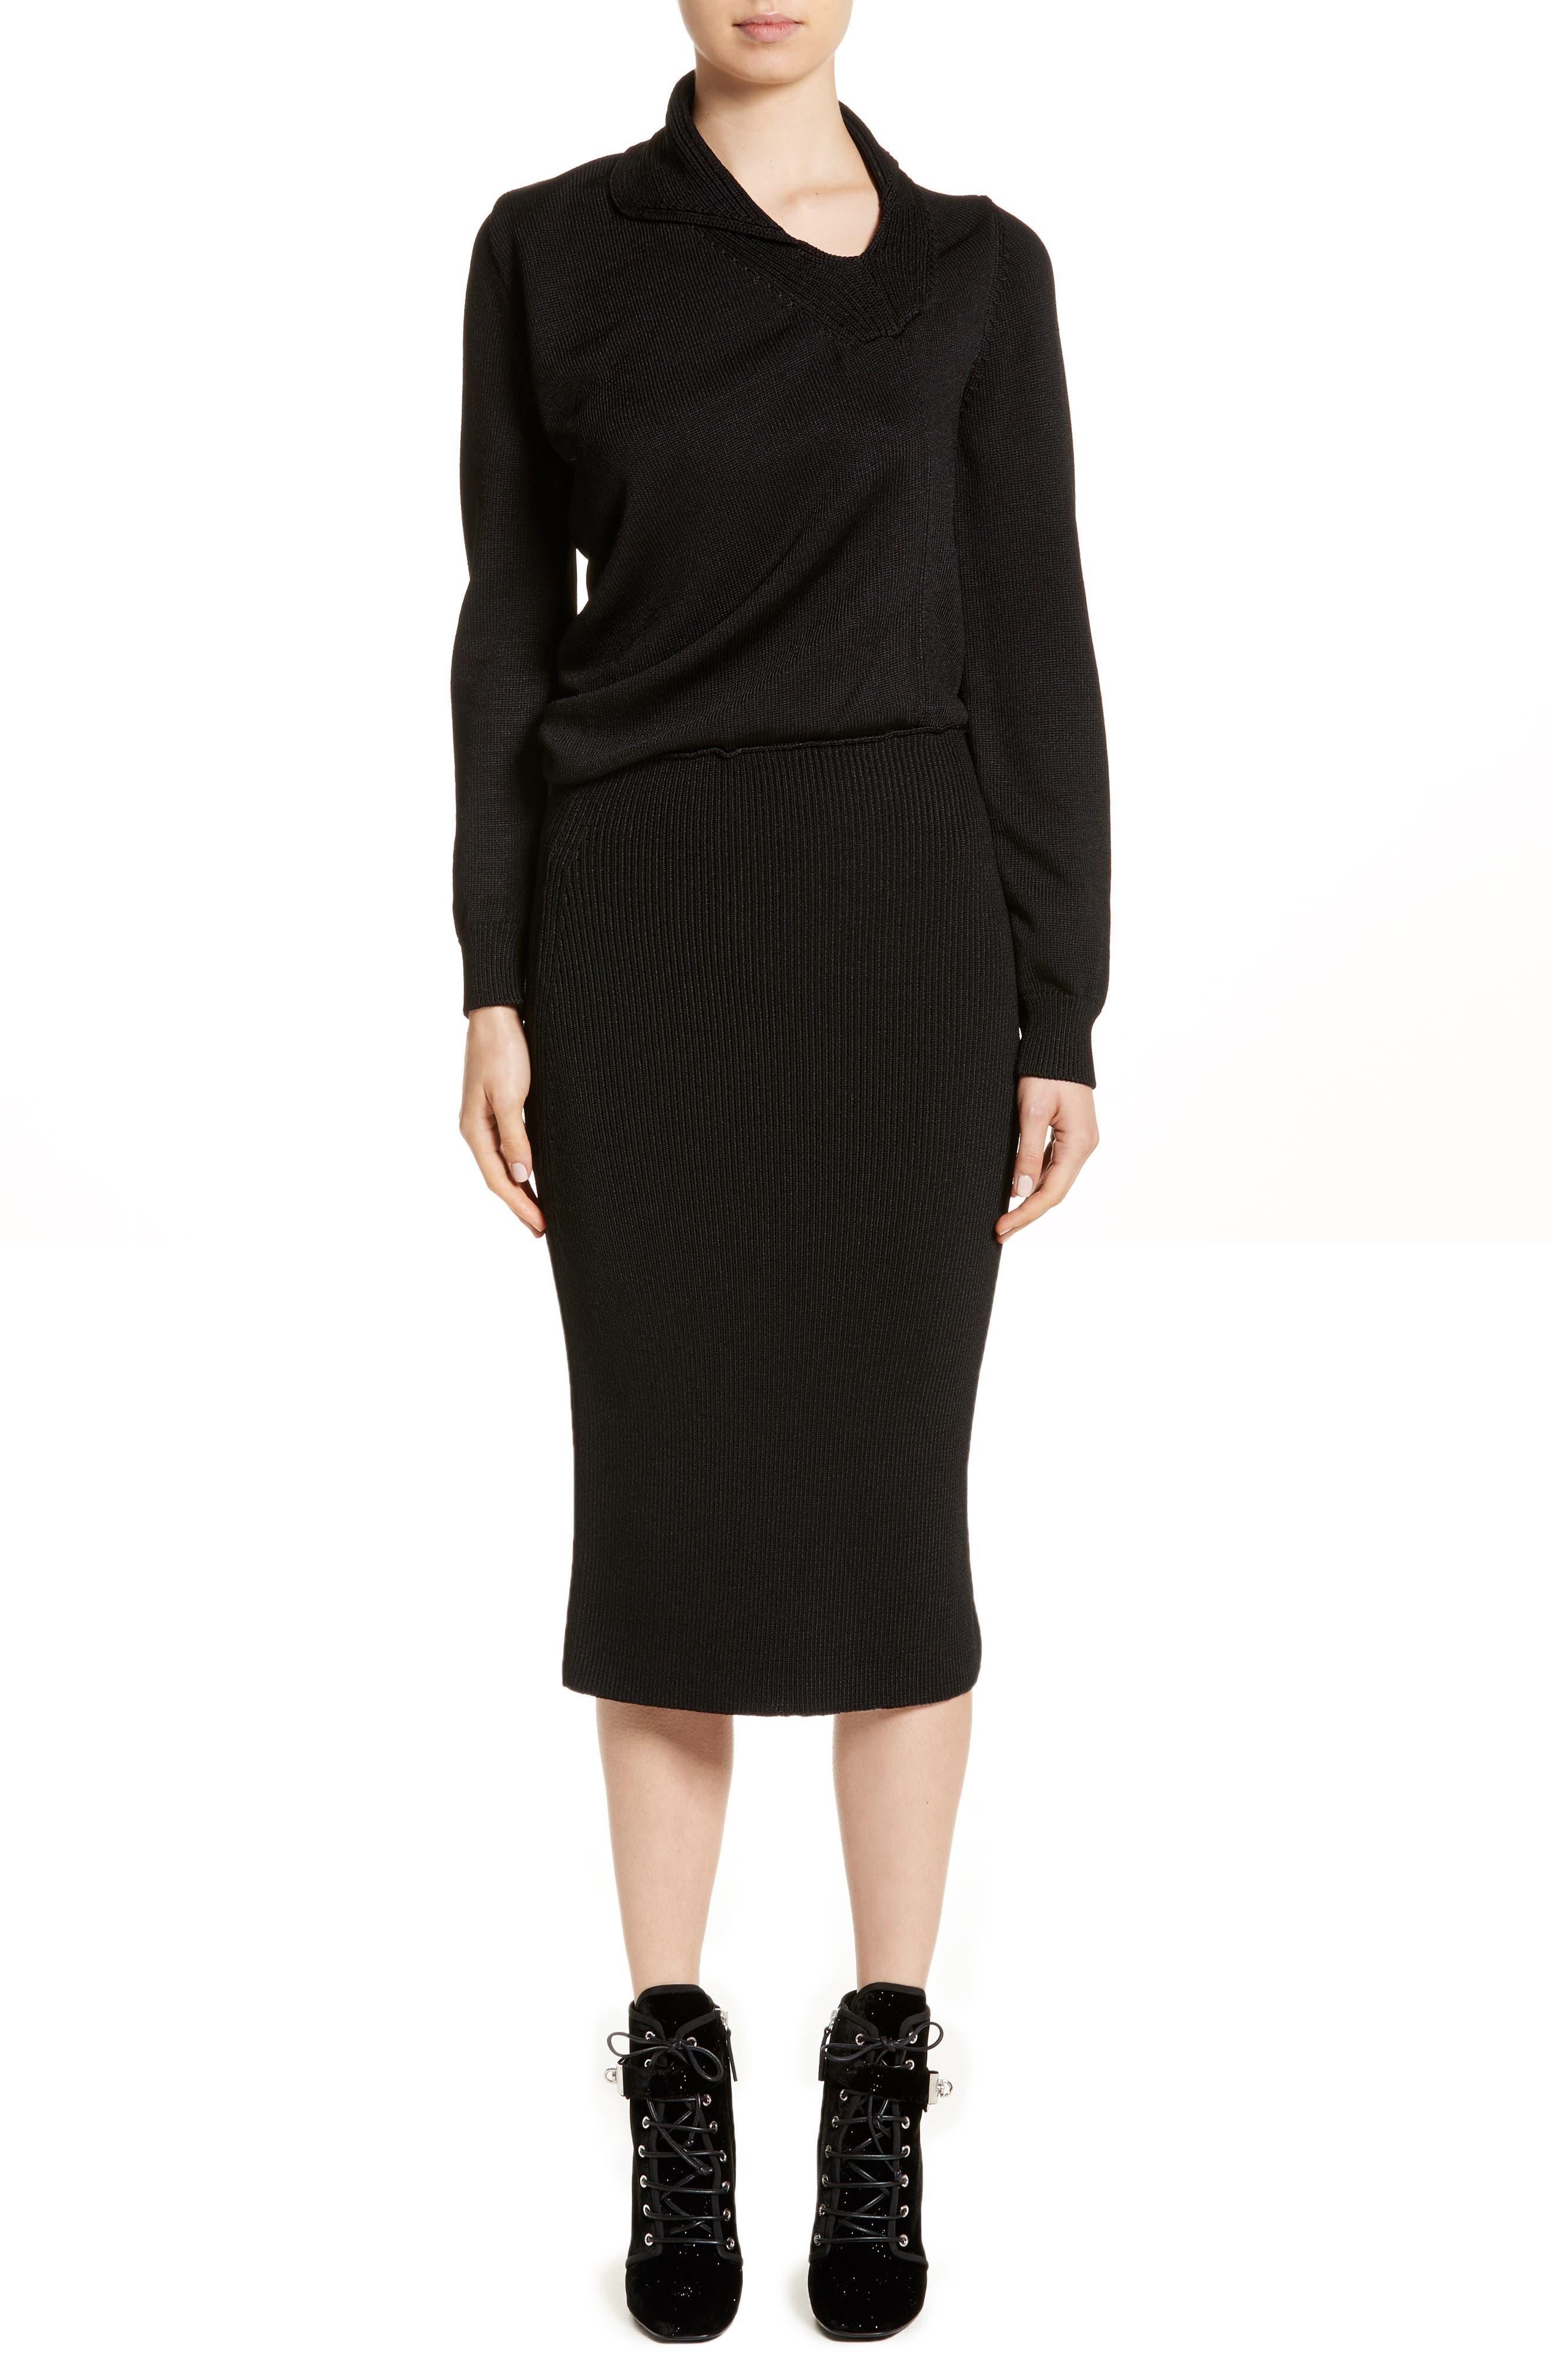 Main Image - Atlein Drape Knit Dress